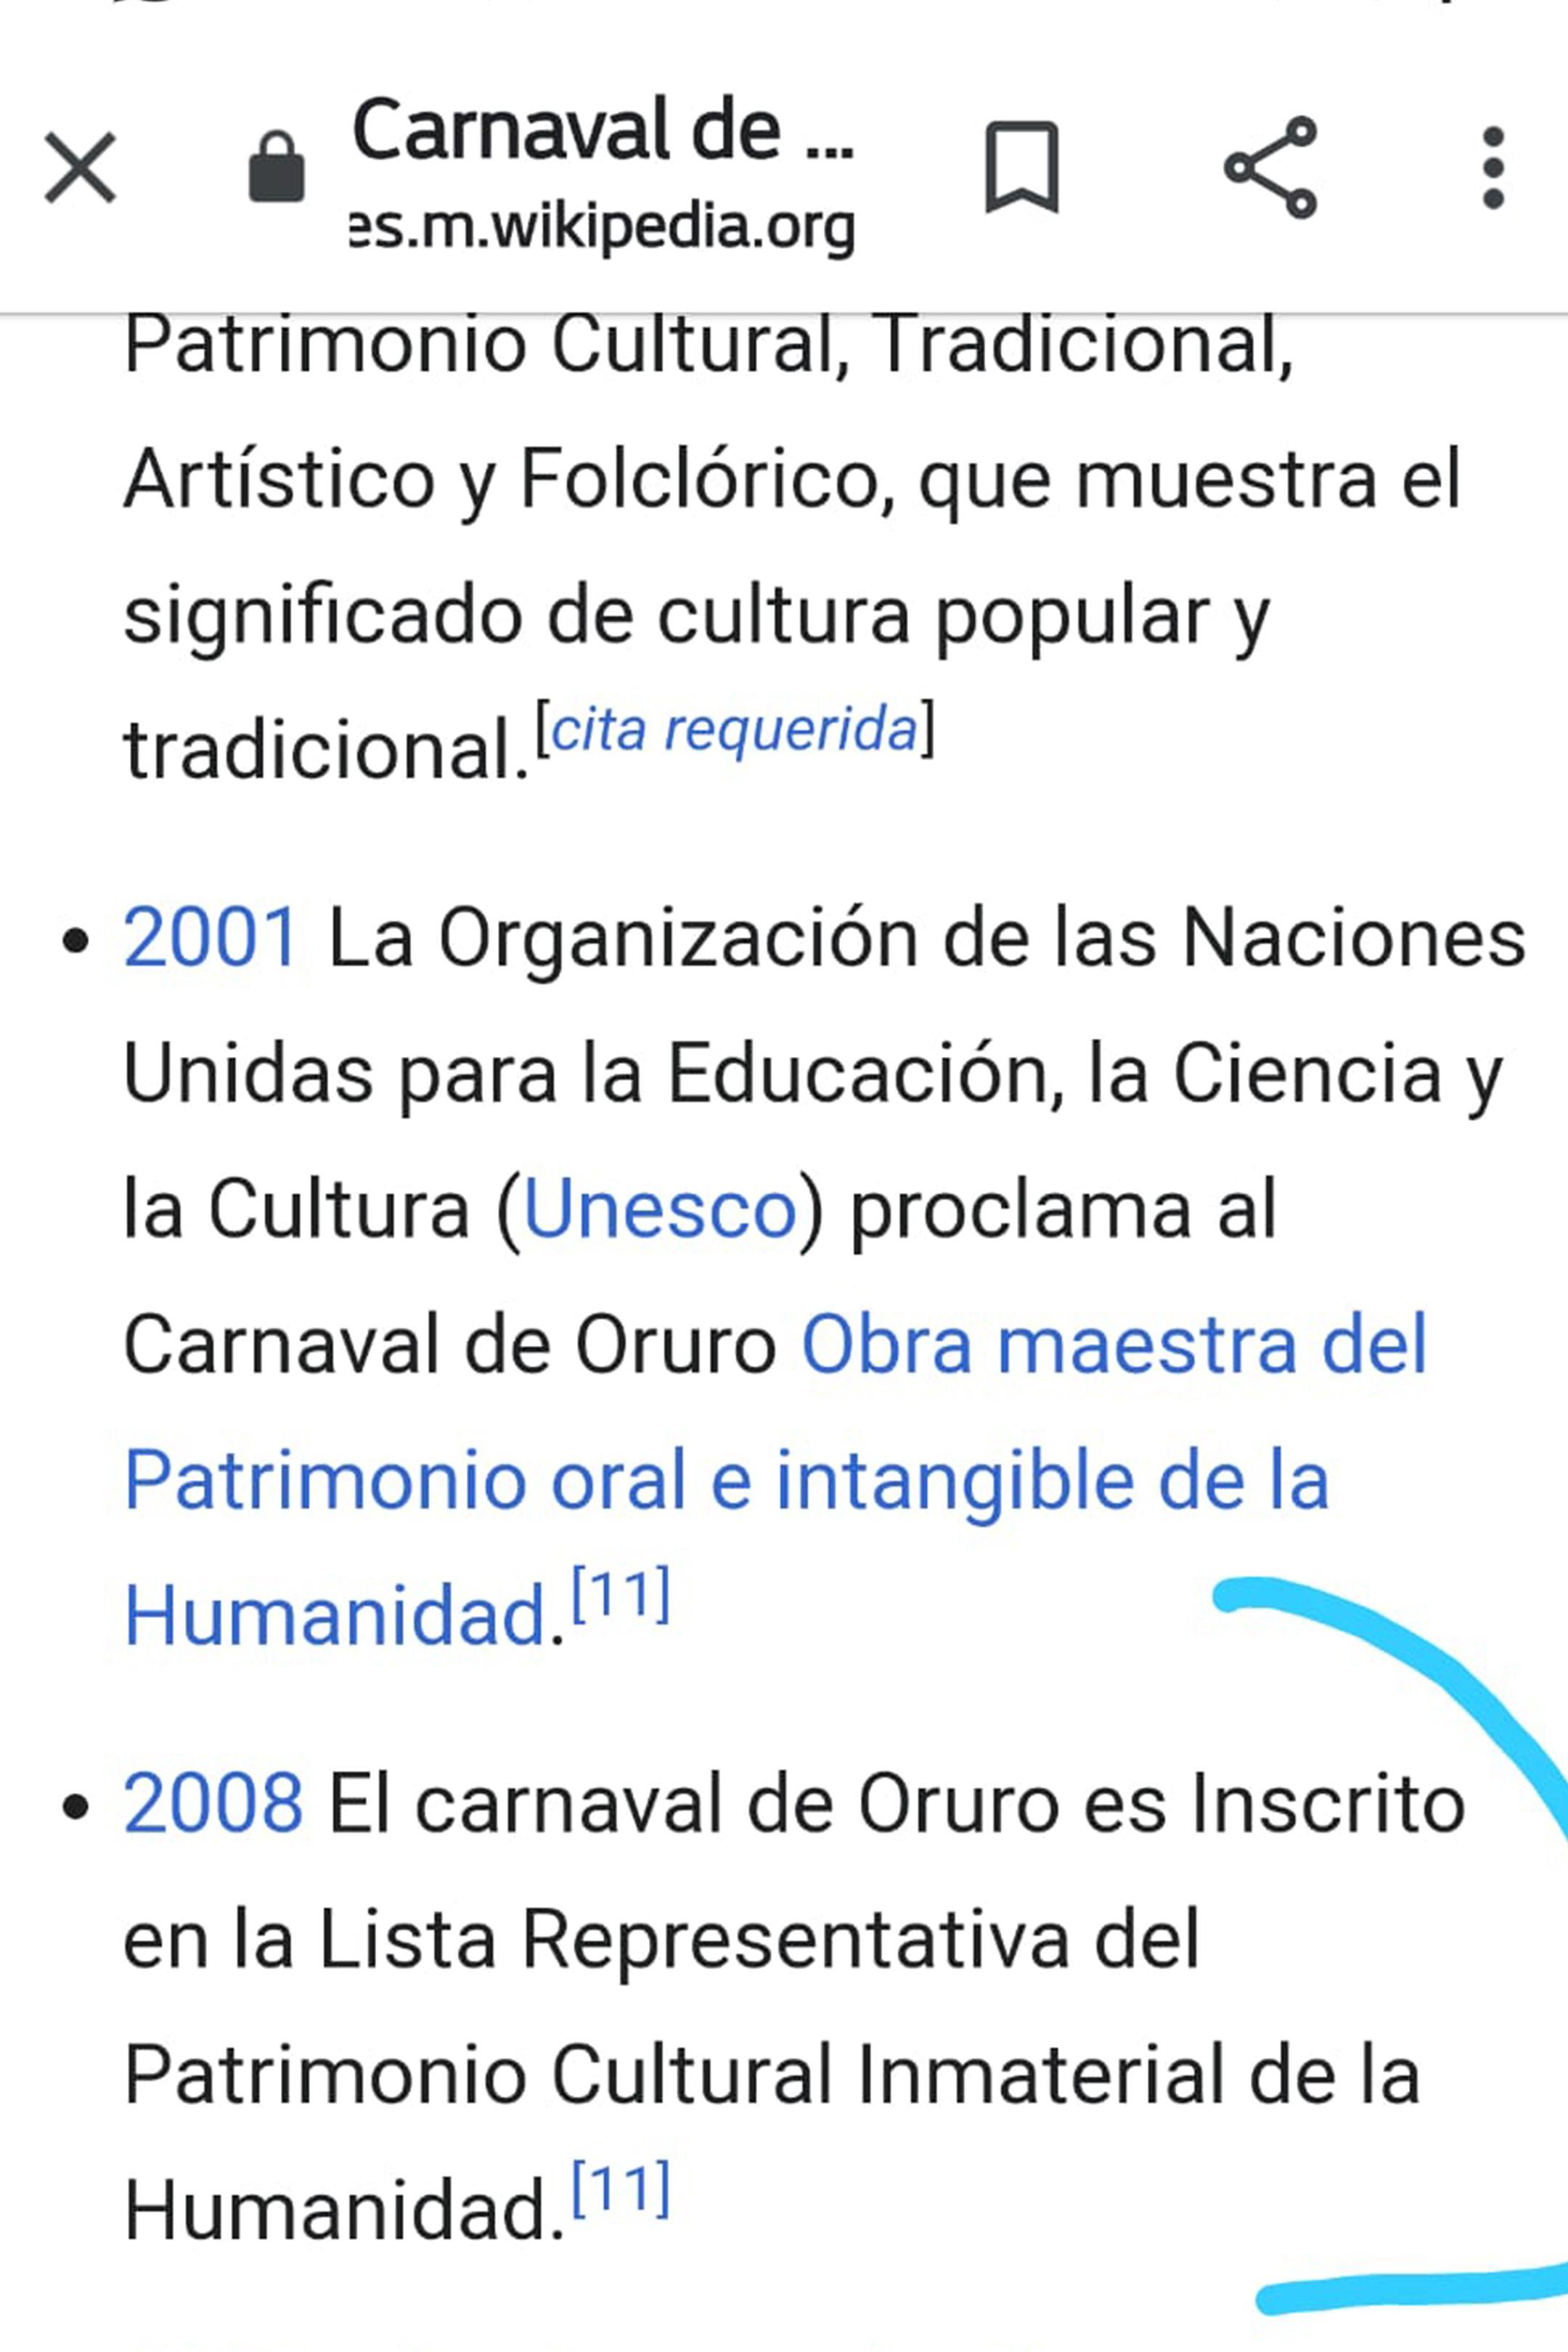 Carnaval De Oruro In 2021